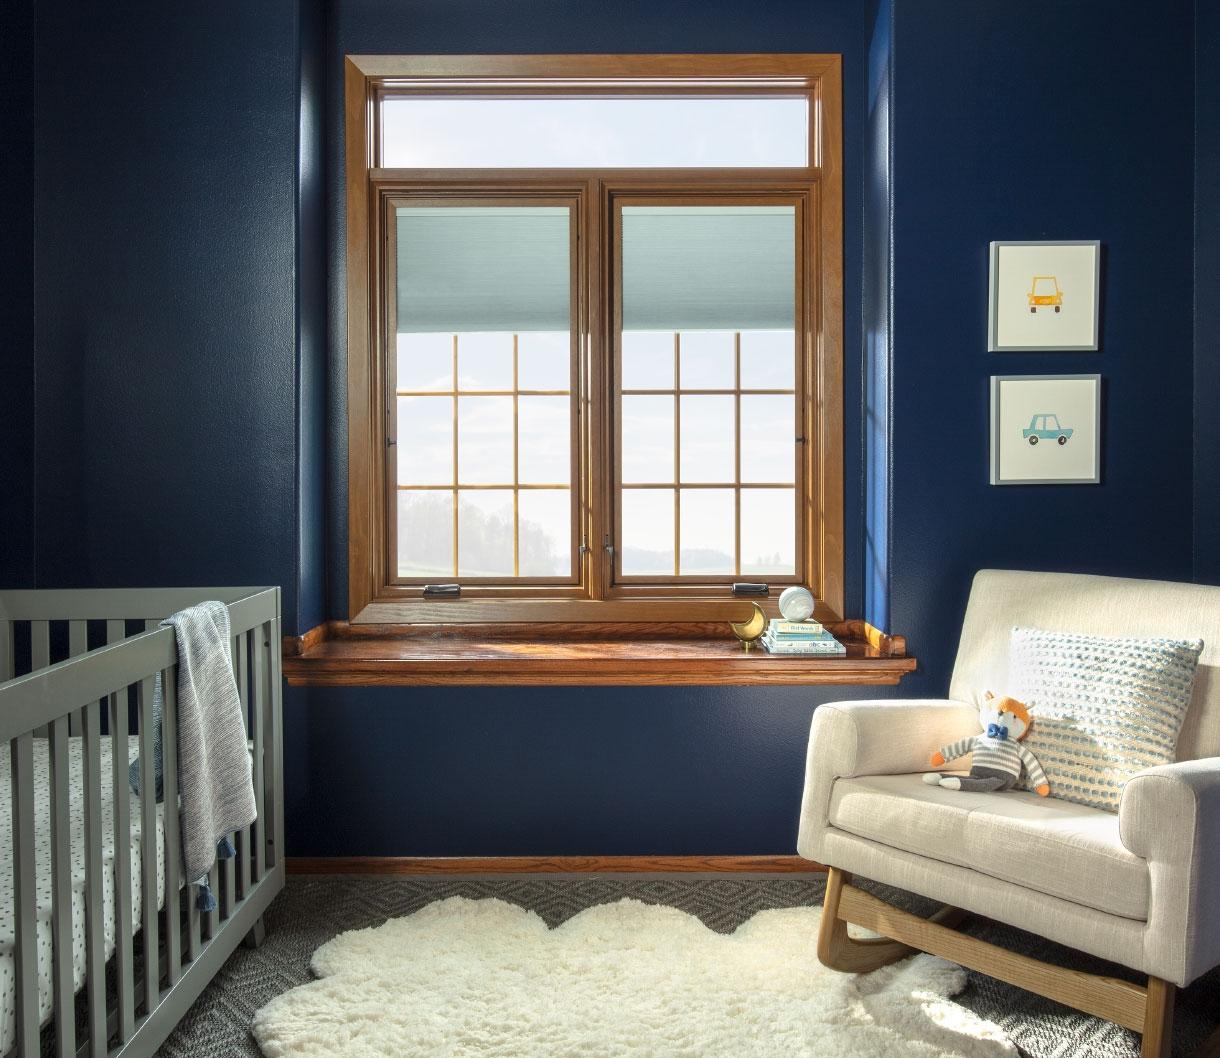 lifestyle-wood-casement-nursery-blue